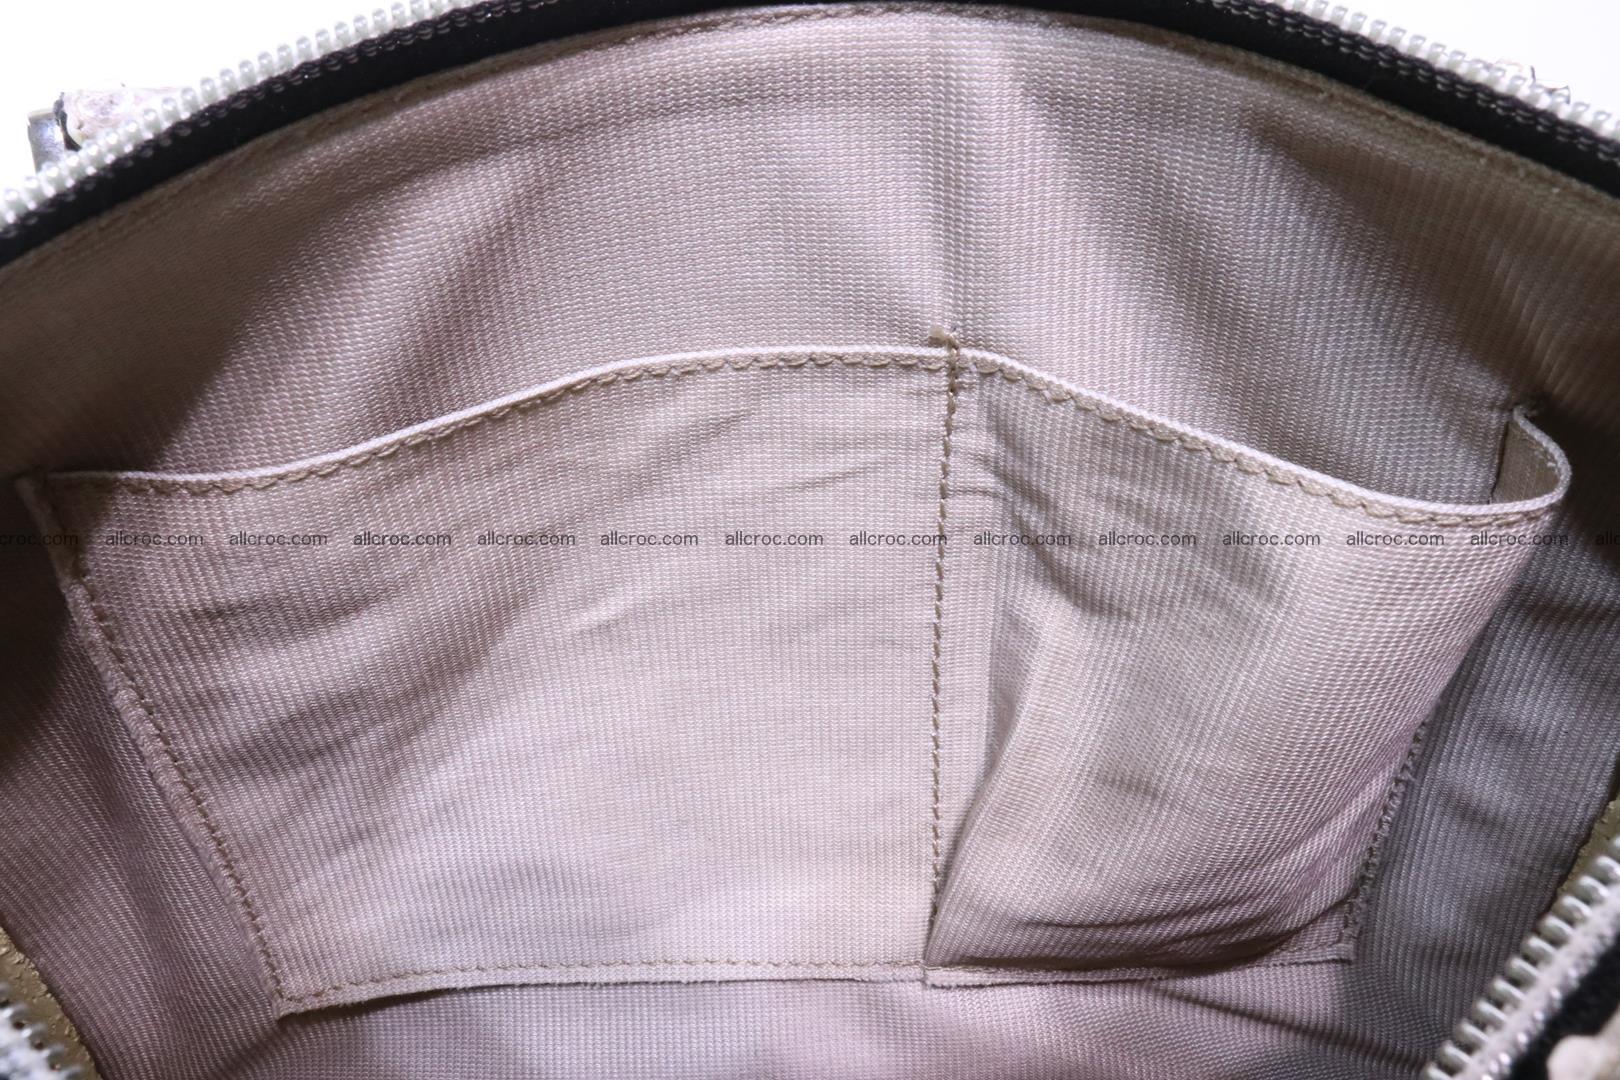 Ladies handbag, valise from genuine python skin MINI 210 Foto 13